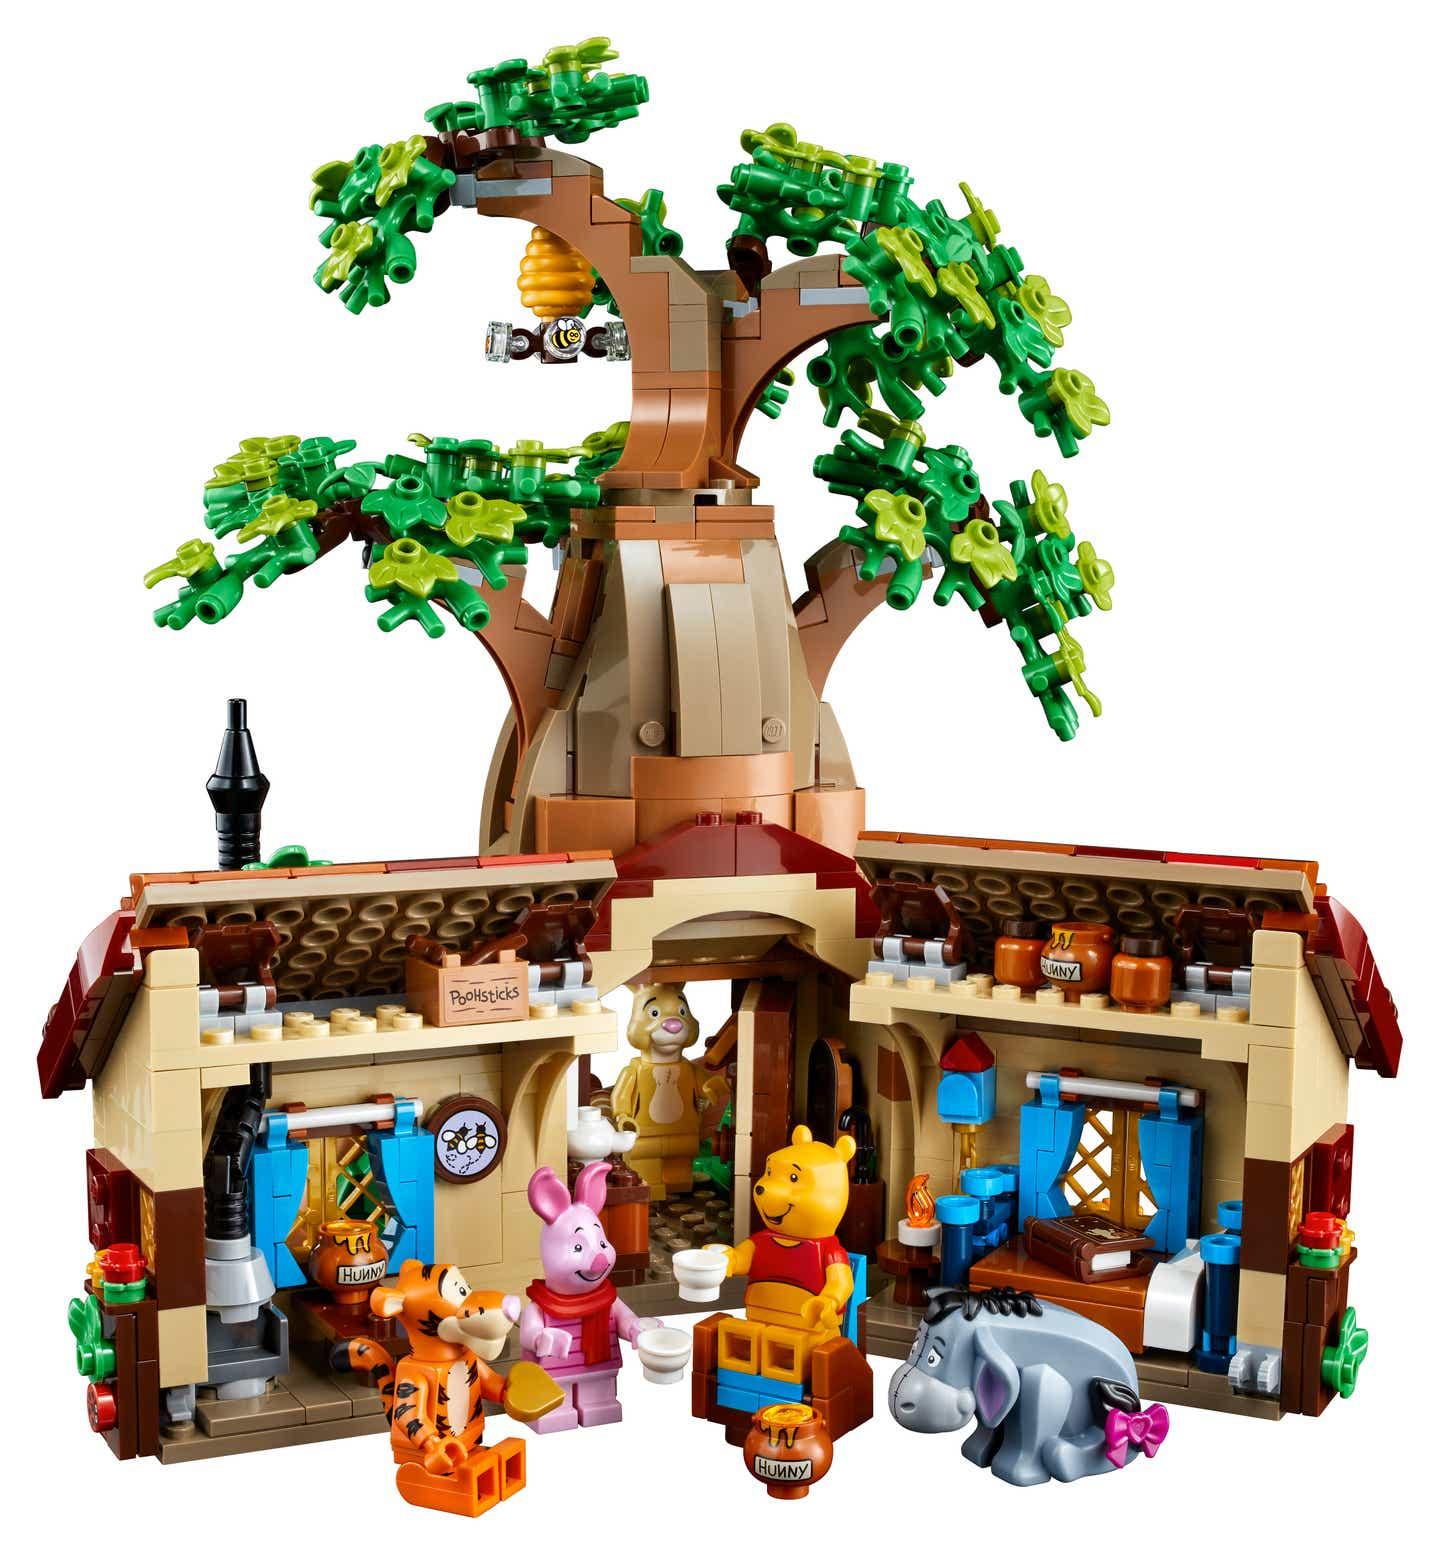 LEGO Ideas 21326 Winnie the Pooh Set